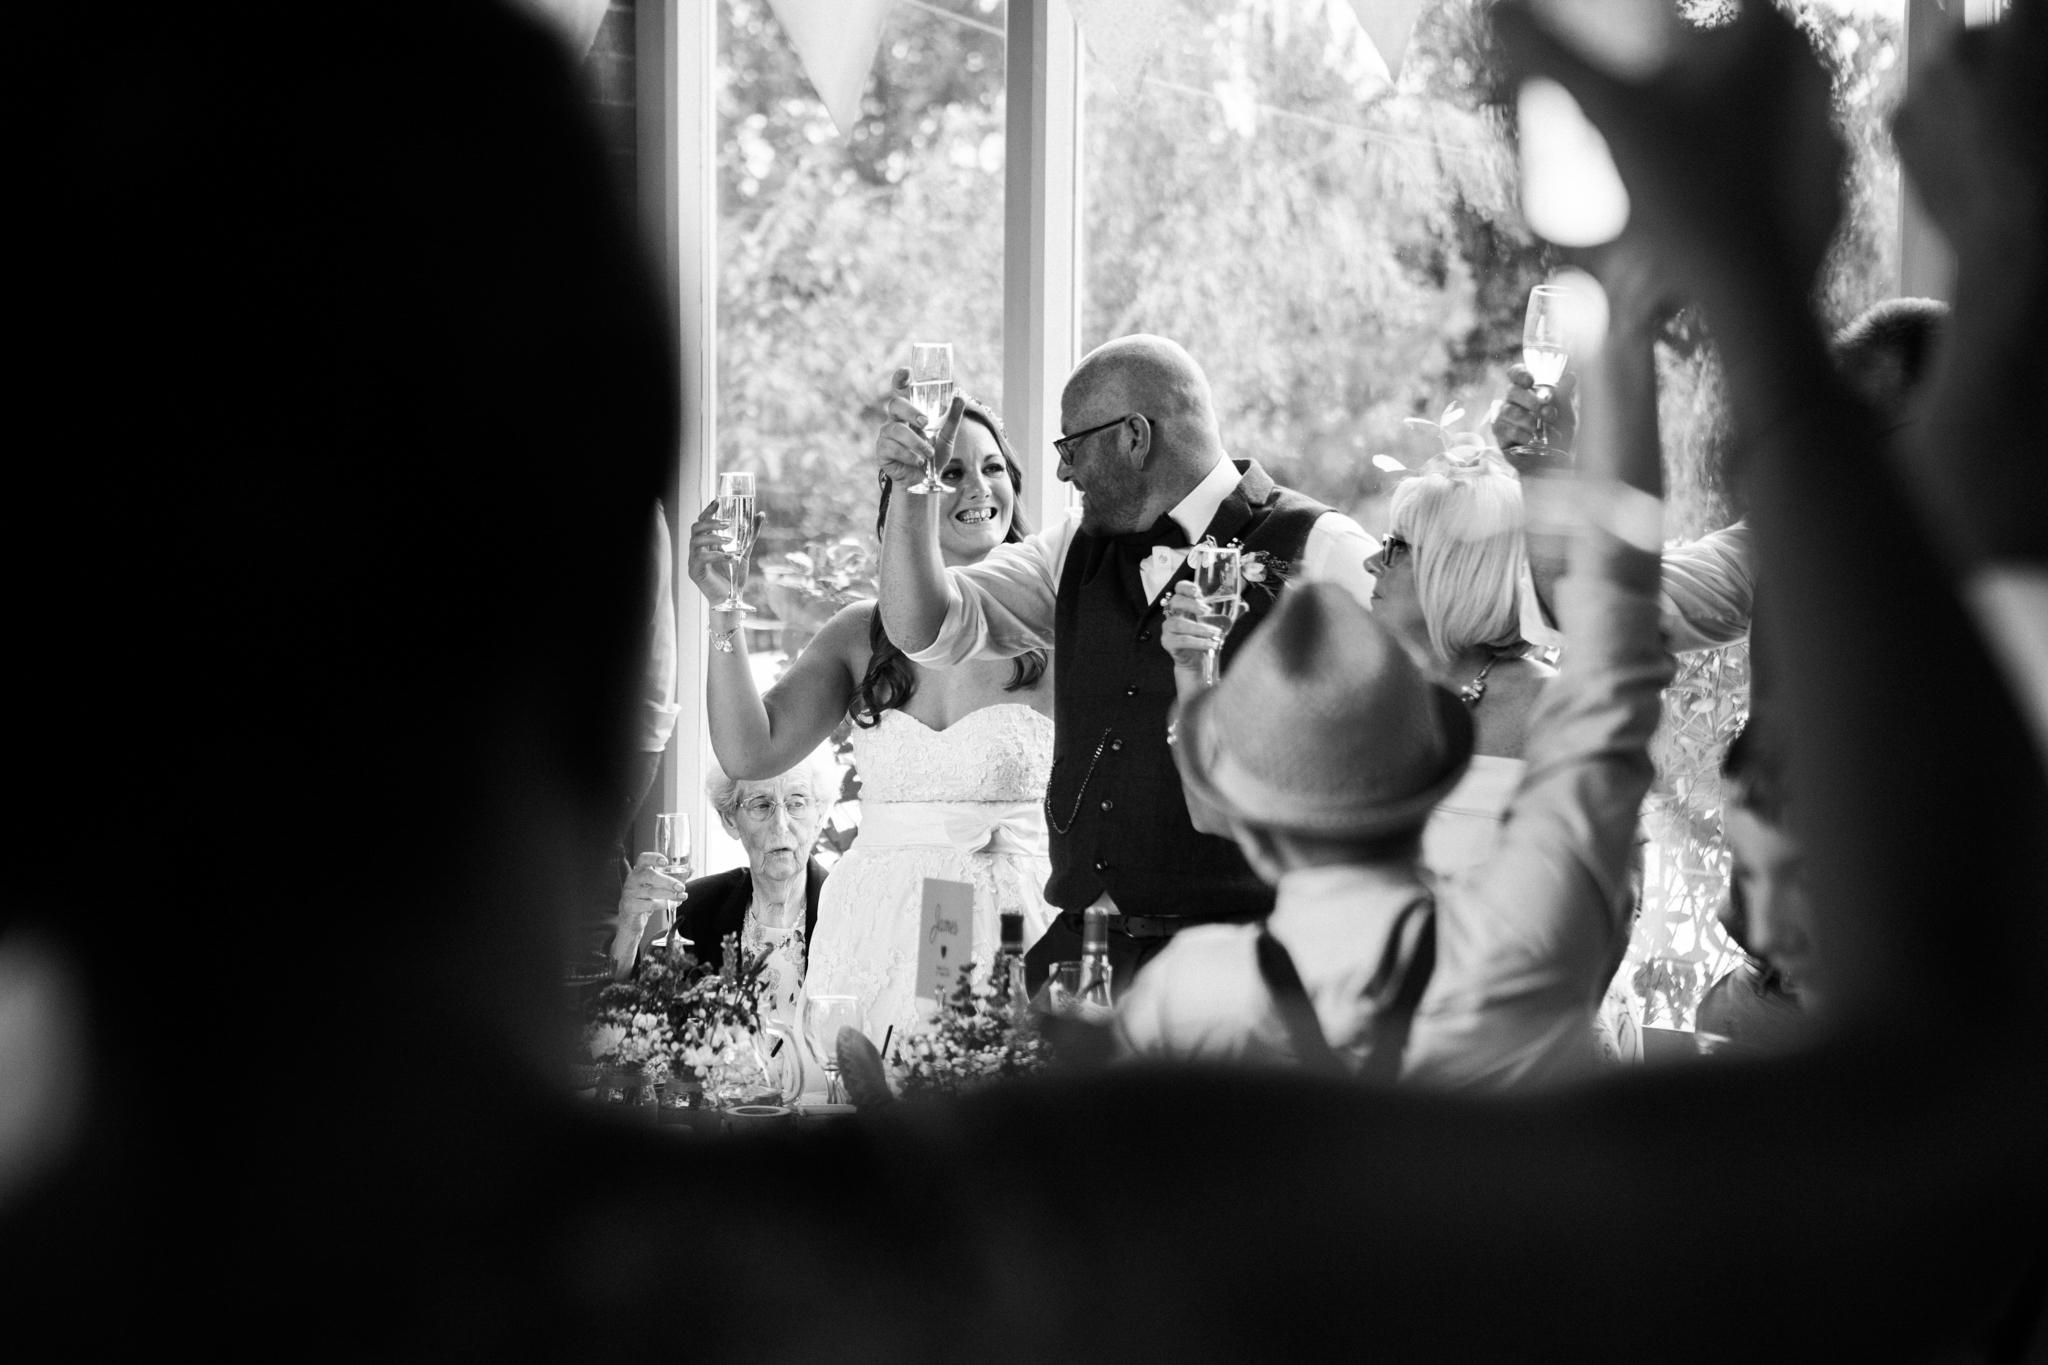 Rowsie & Lee, Swallows Nest Barn Wedding, Cotswold wedding photographer, Warwickshire Wedding Photographer-141.jpg